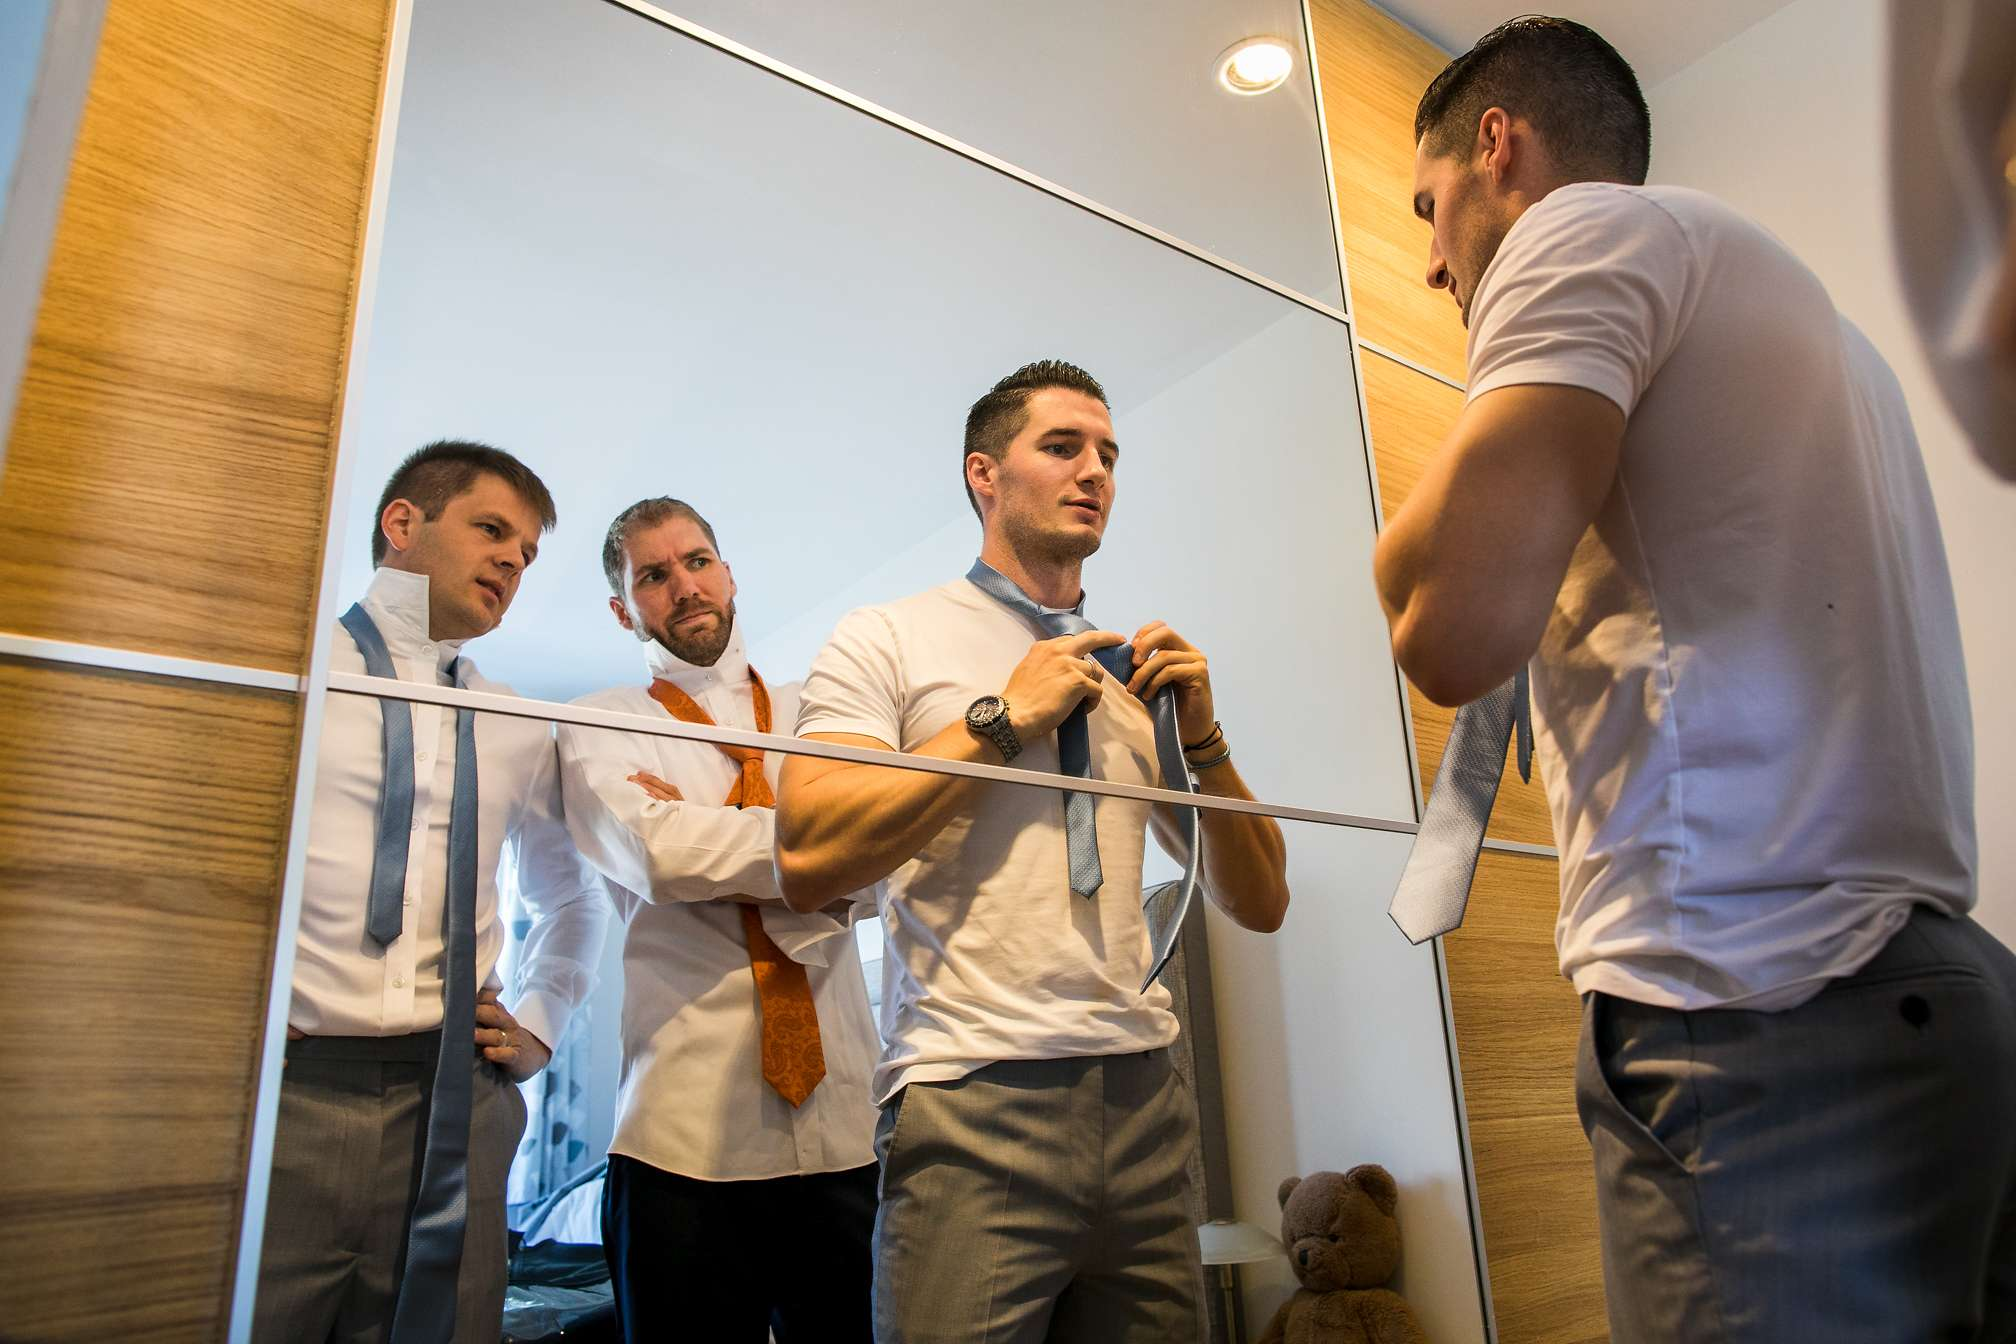 Funny tie moment during groomsmen prep